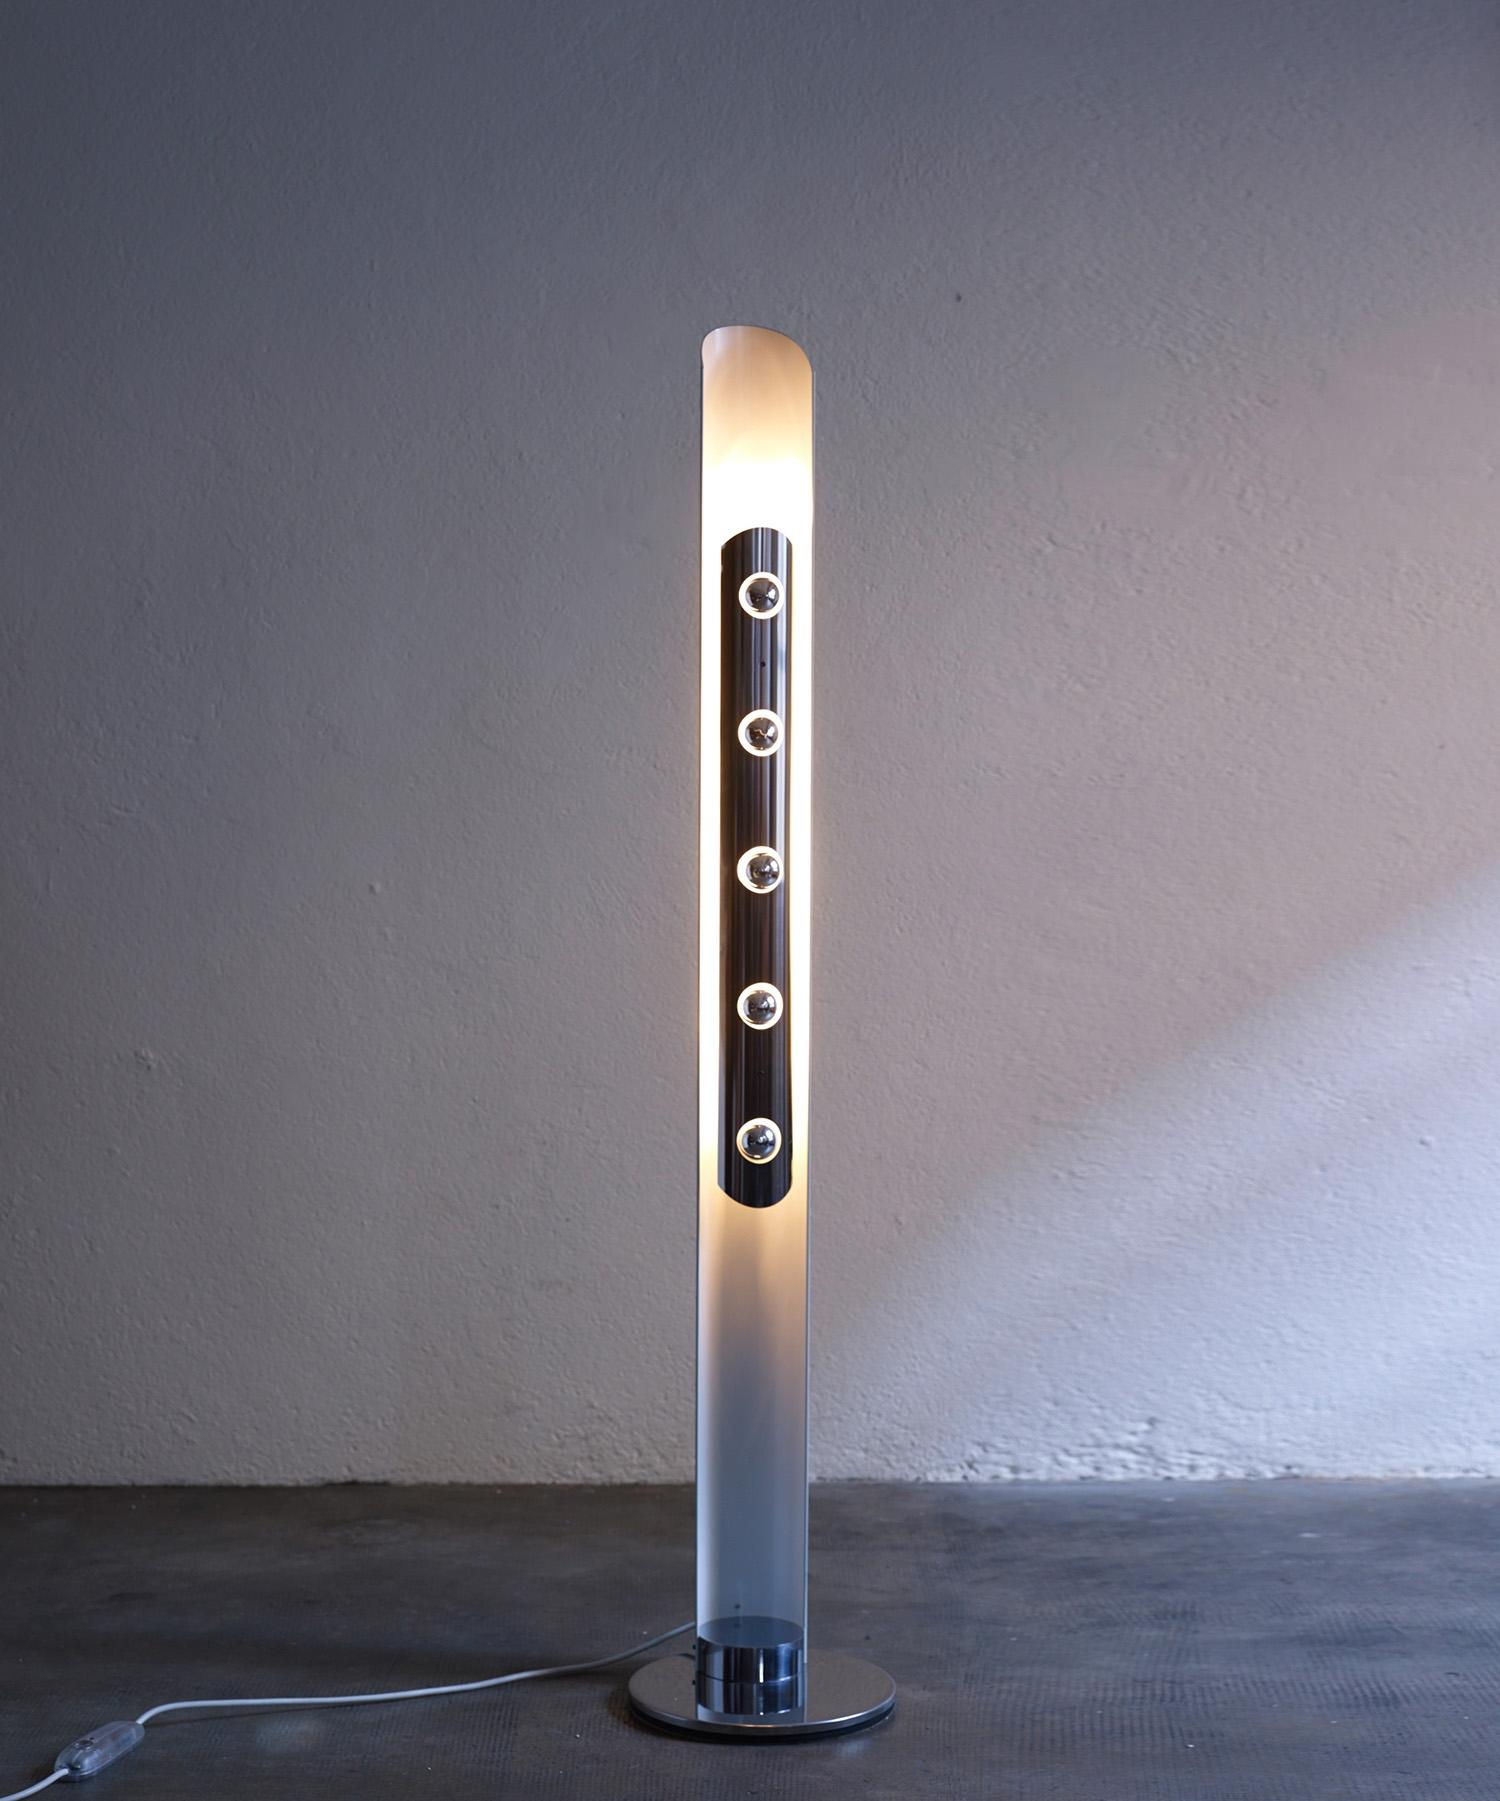 italian-floor-lamp-by-enrico-tronconi-1970-image-01